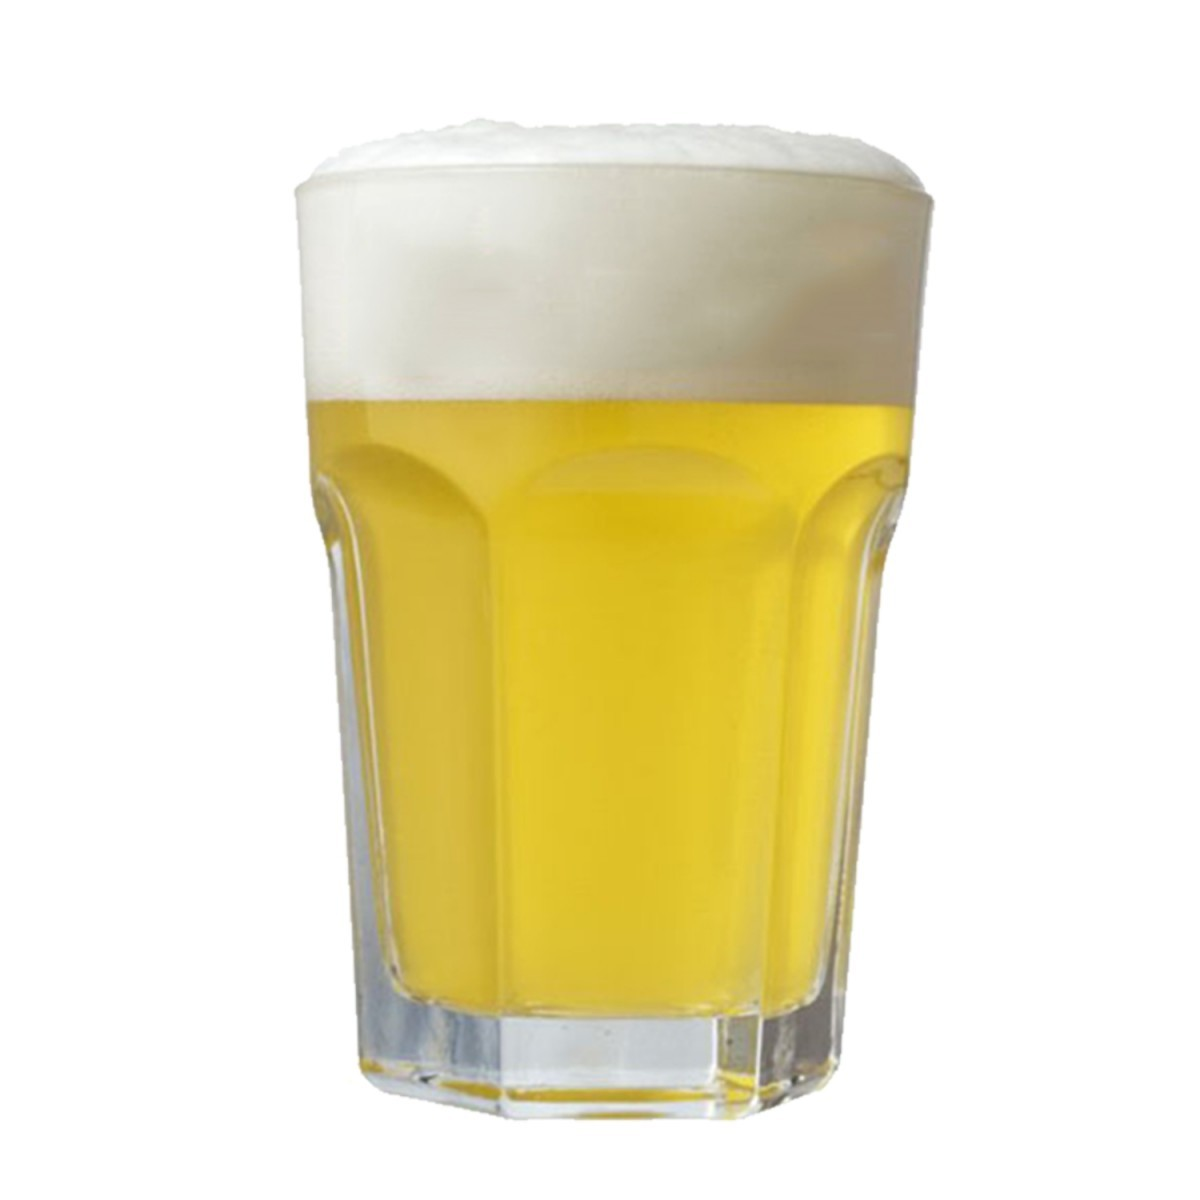 Kit de Insumos Cerveja de Panela - Witbier   - CERVEJA DE PANELA